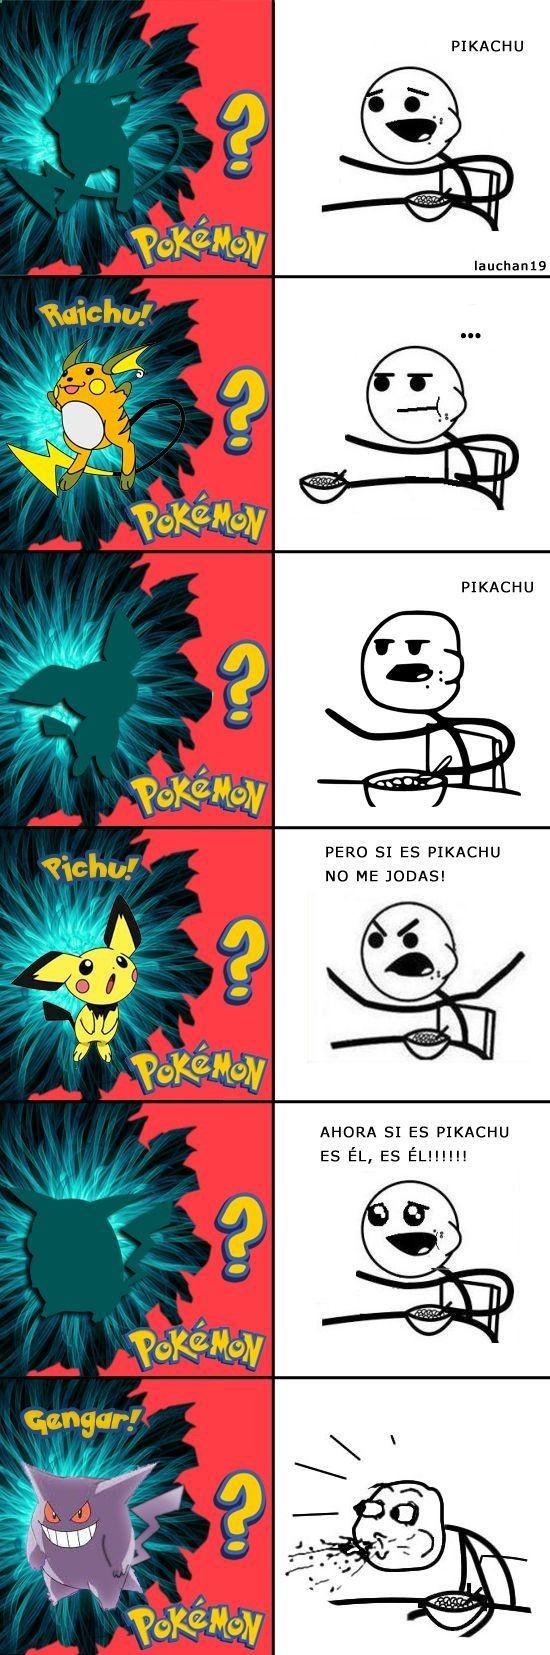 Chistes De Pokemon Dragon Ball Z Naruto Y Naruto Shippude Pokemon Memes Pokemon Funny Funny Memes